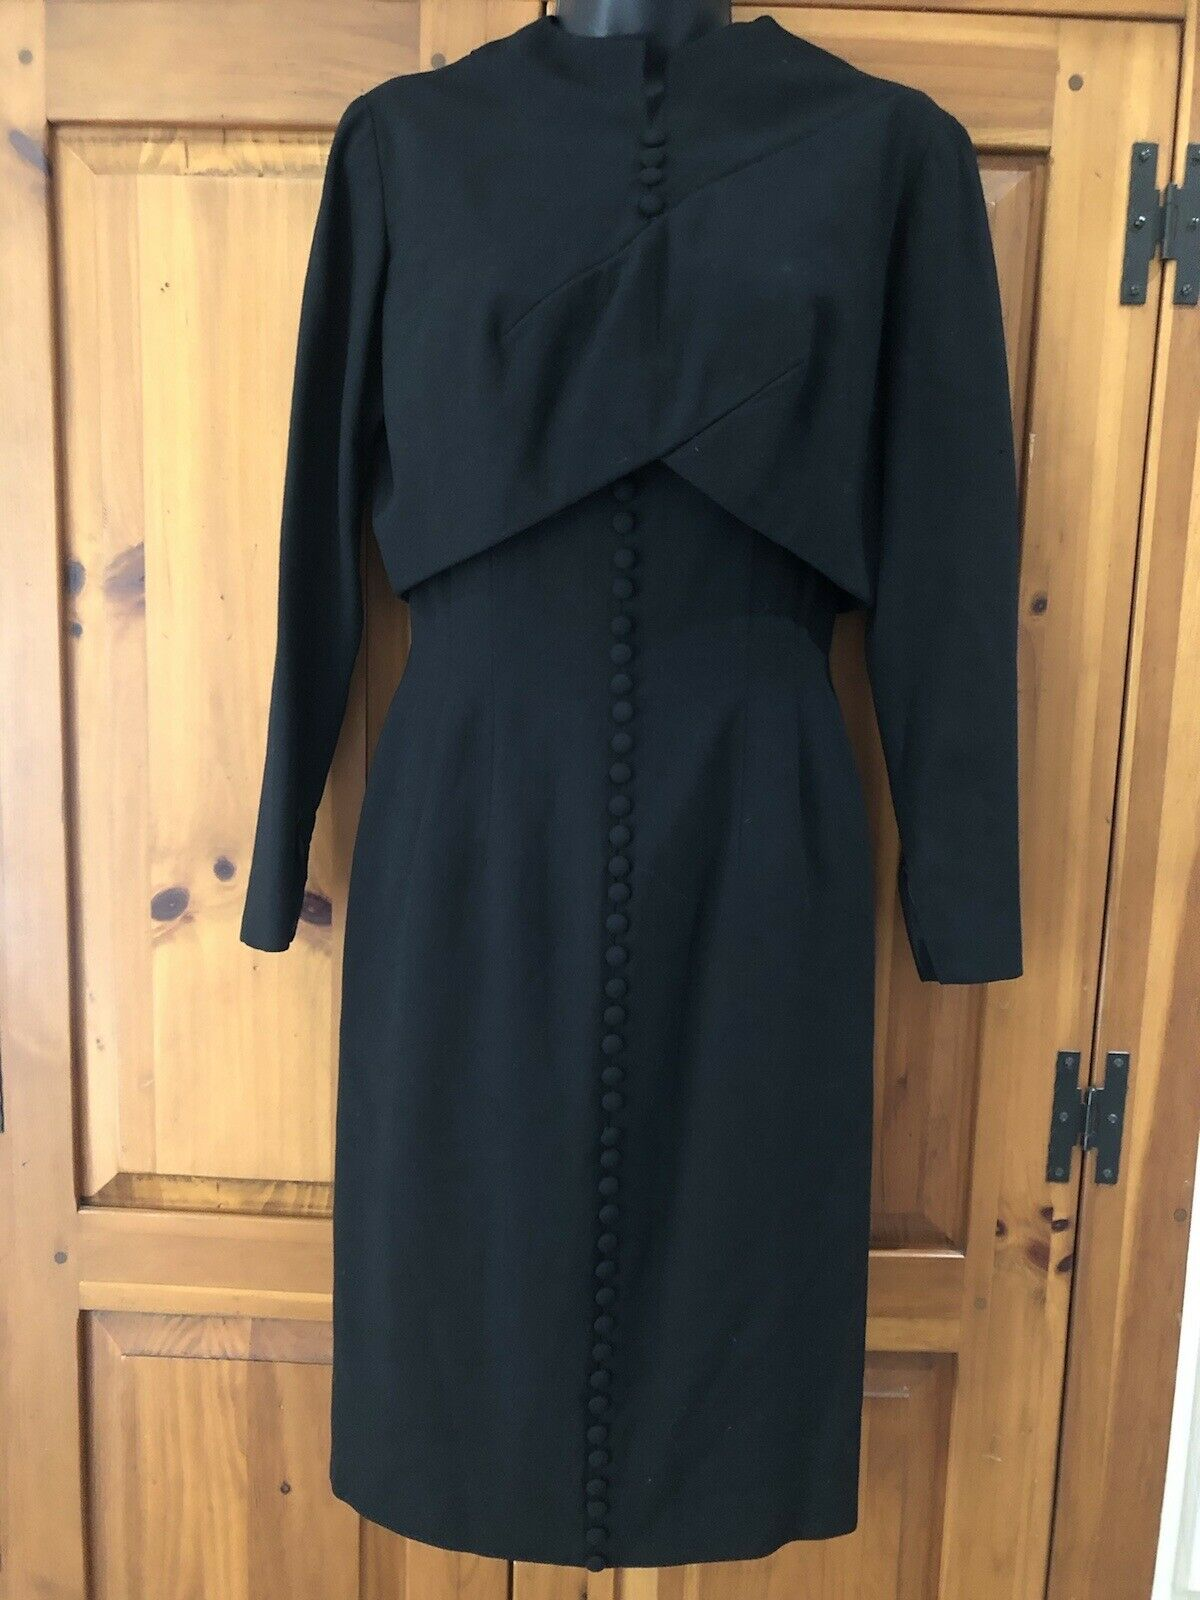 Travilla vintage 60s/70s black wool crepe dress s… - image 2